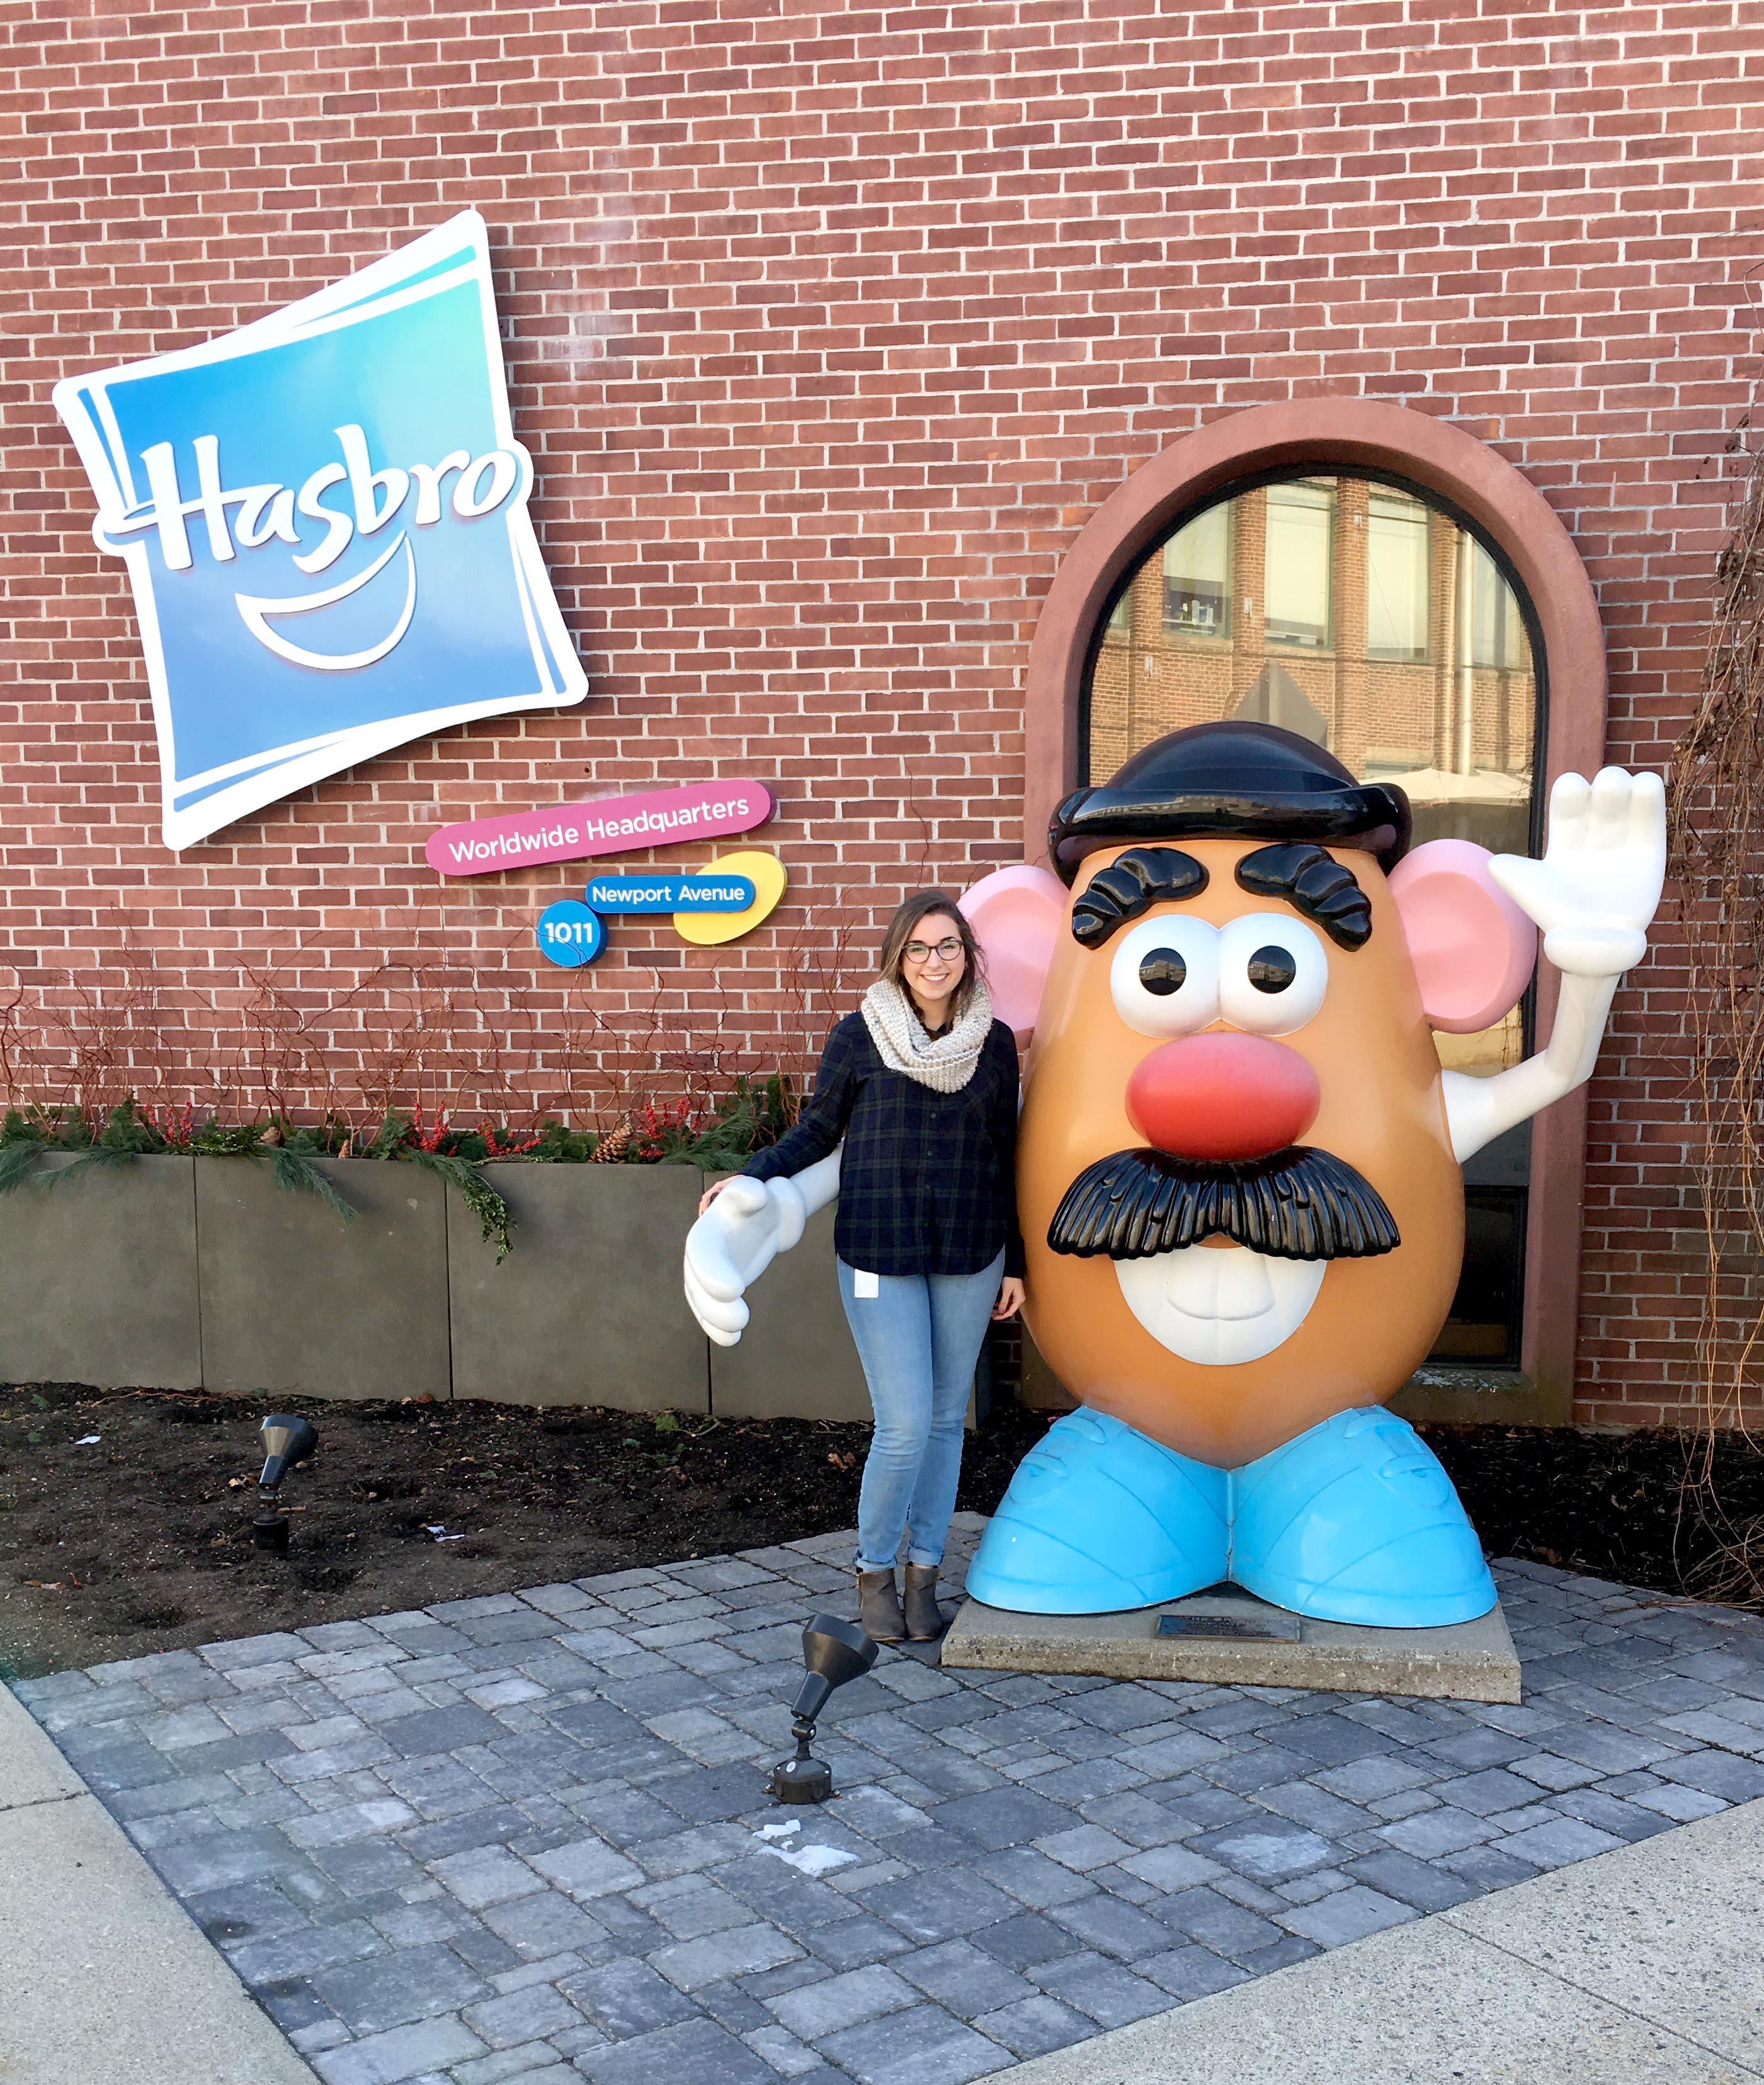 Emily Wise at Hasbro Headquarters